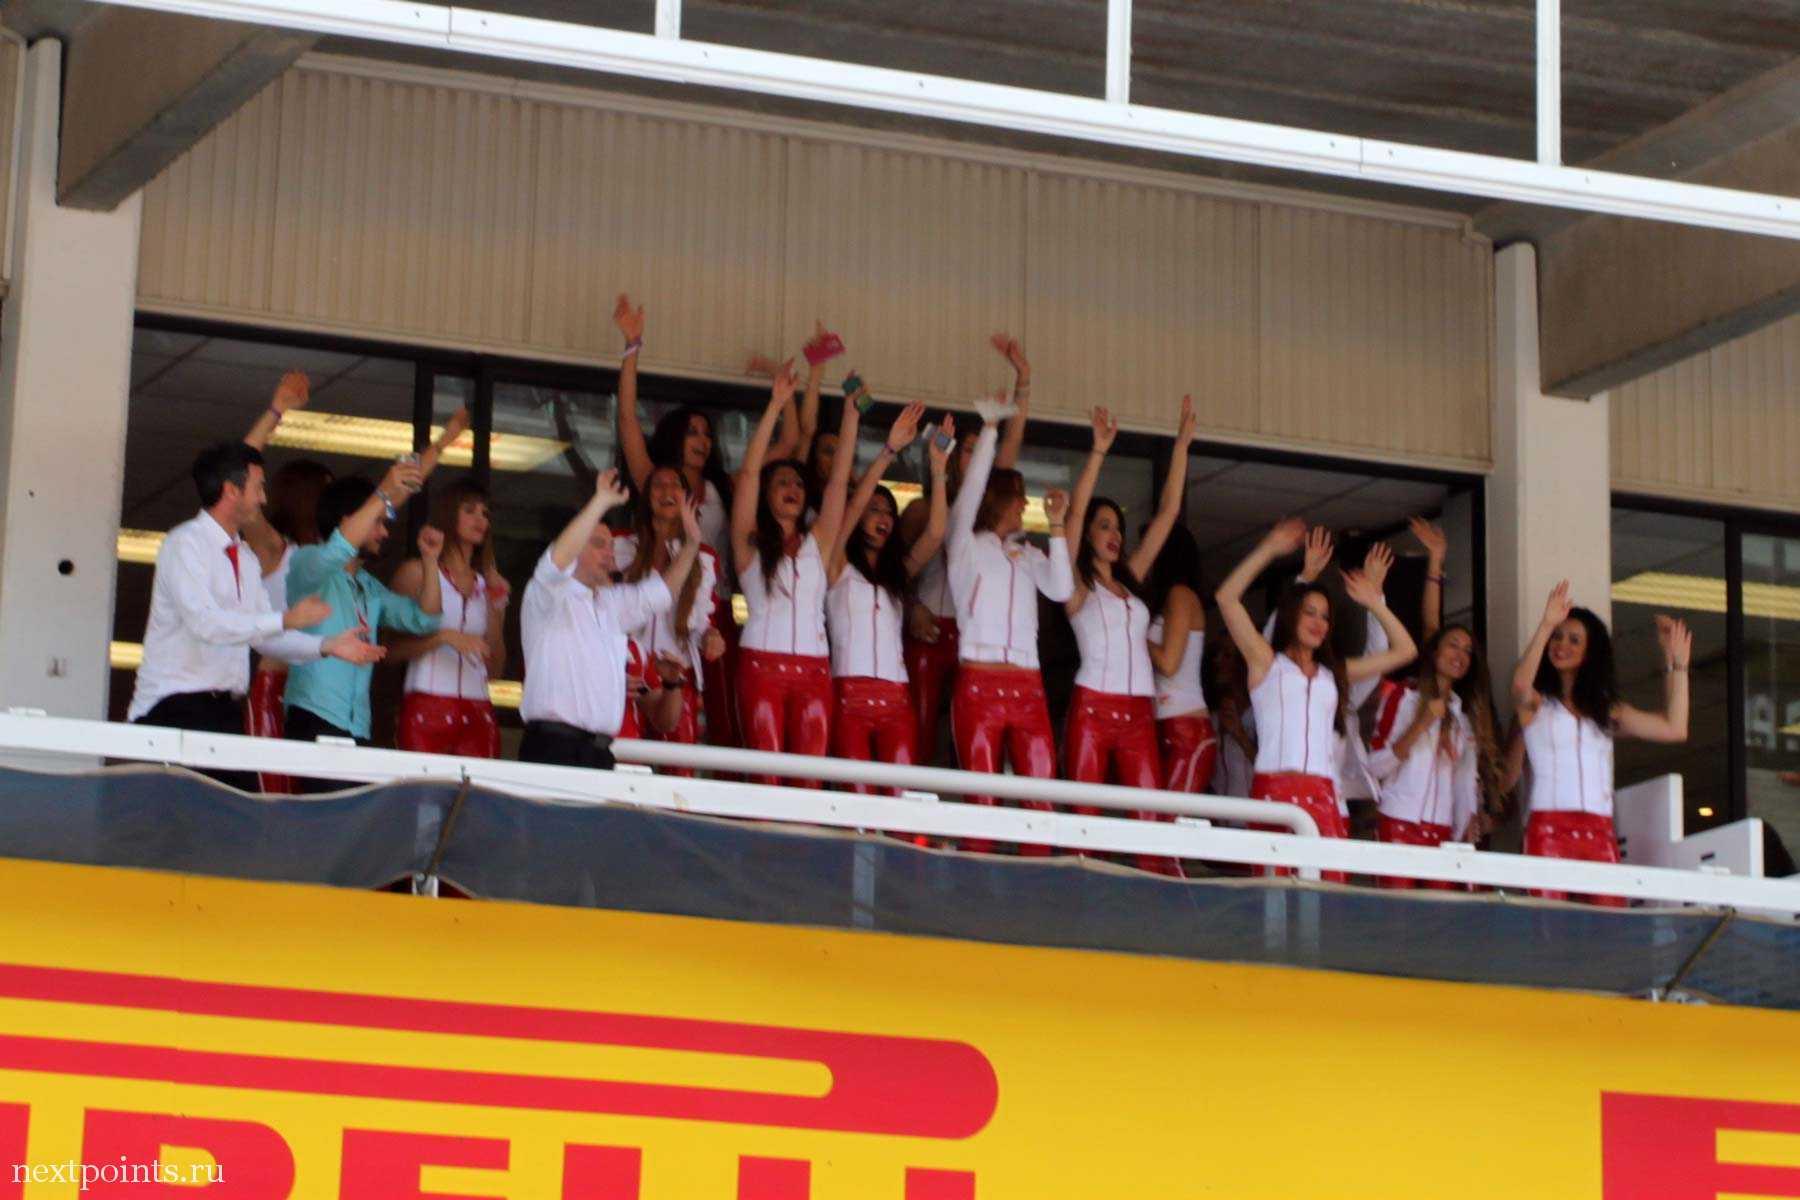 Spain girls в красных штанишках